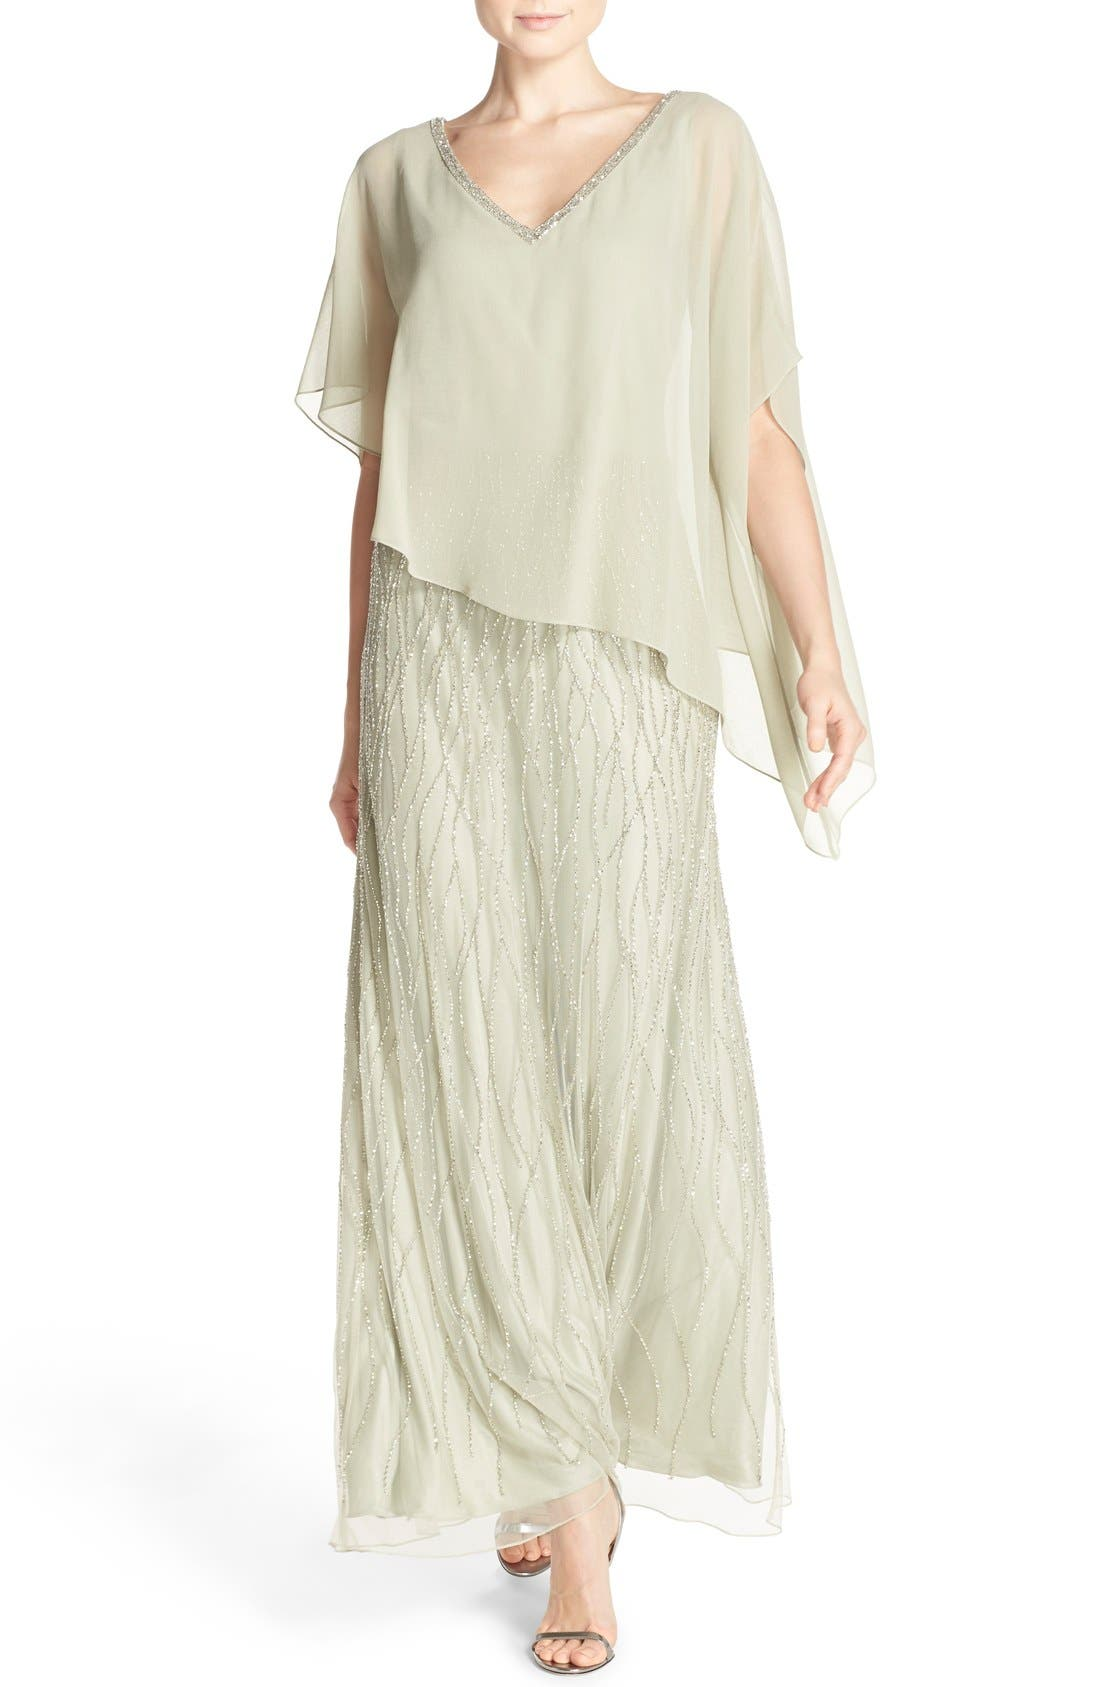 Alternate Image 1 Selected - J Kara Chiffon Overlay Beaded Gown